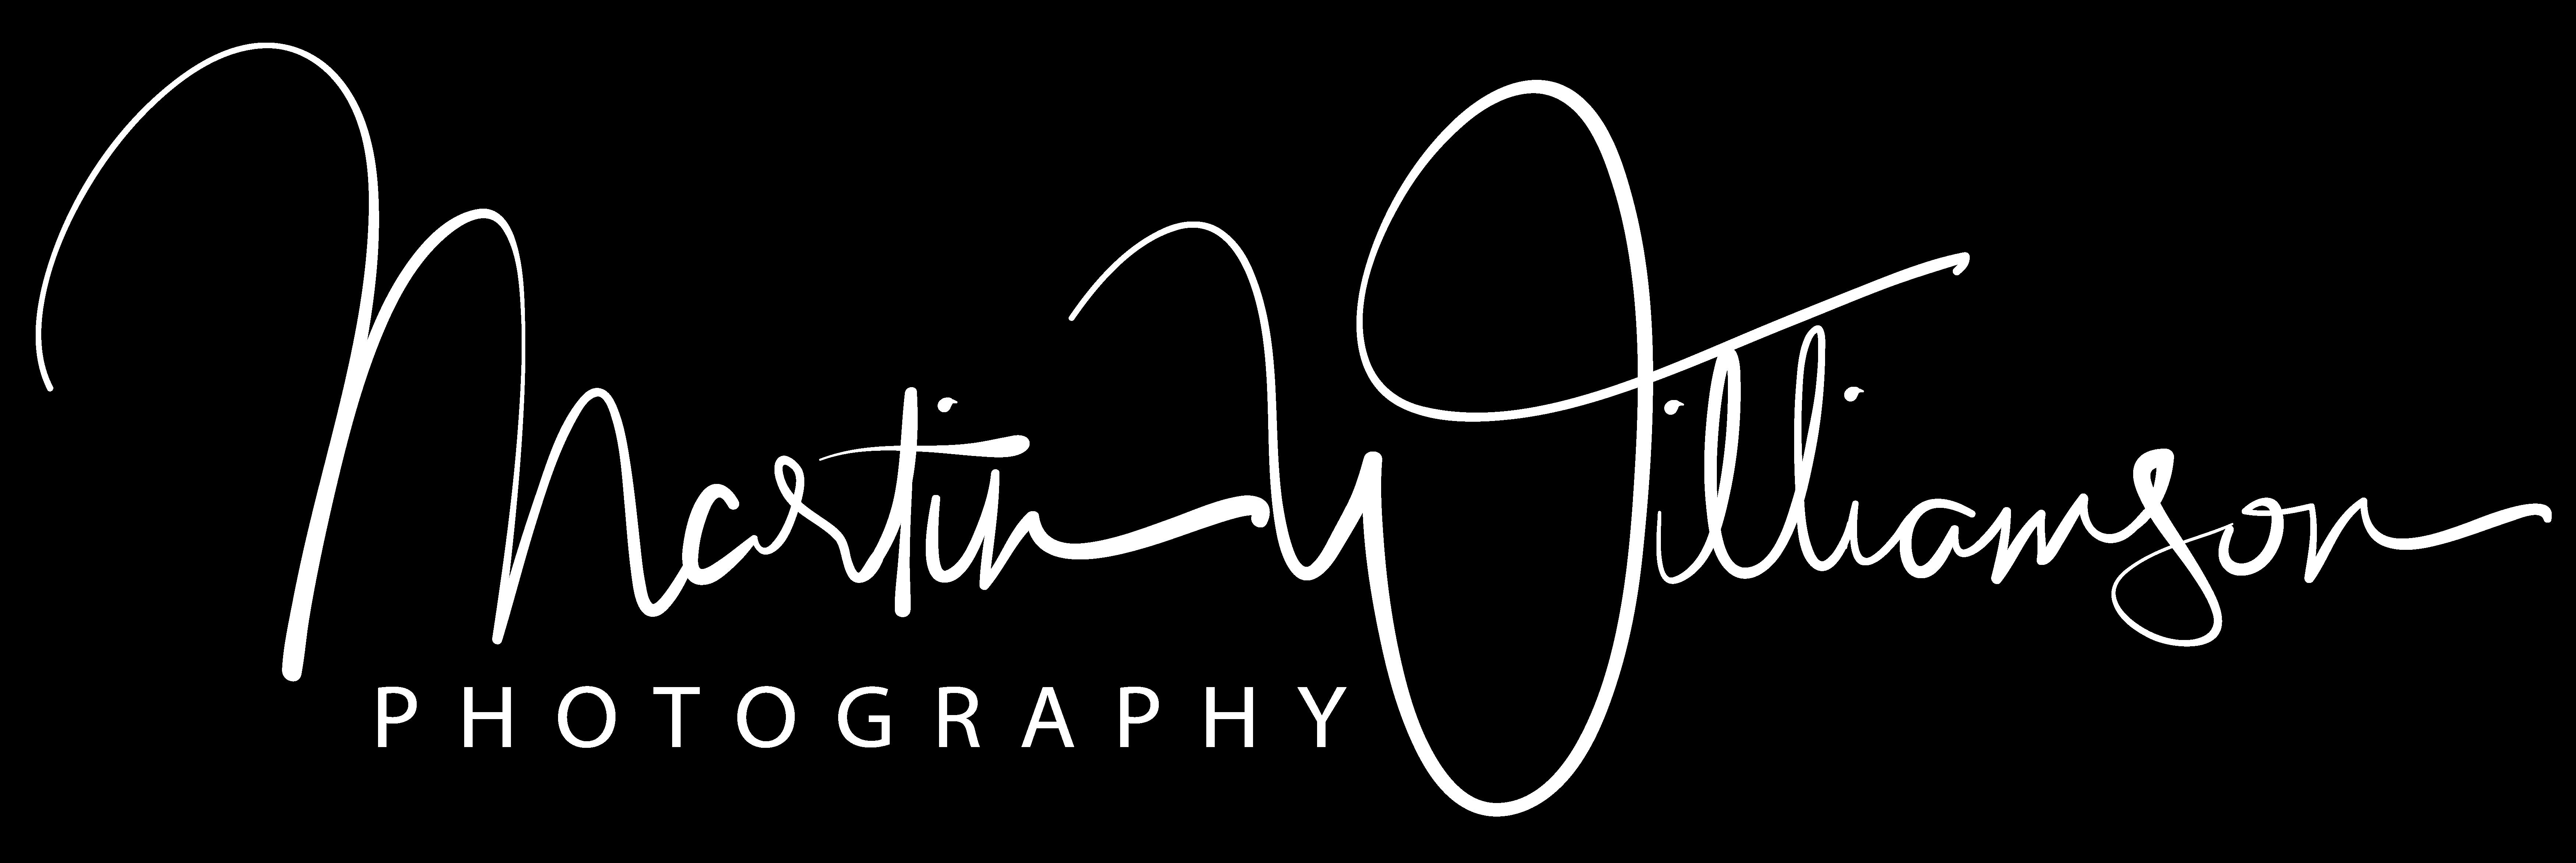 Martin Williamson Photography